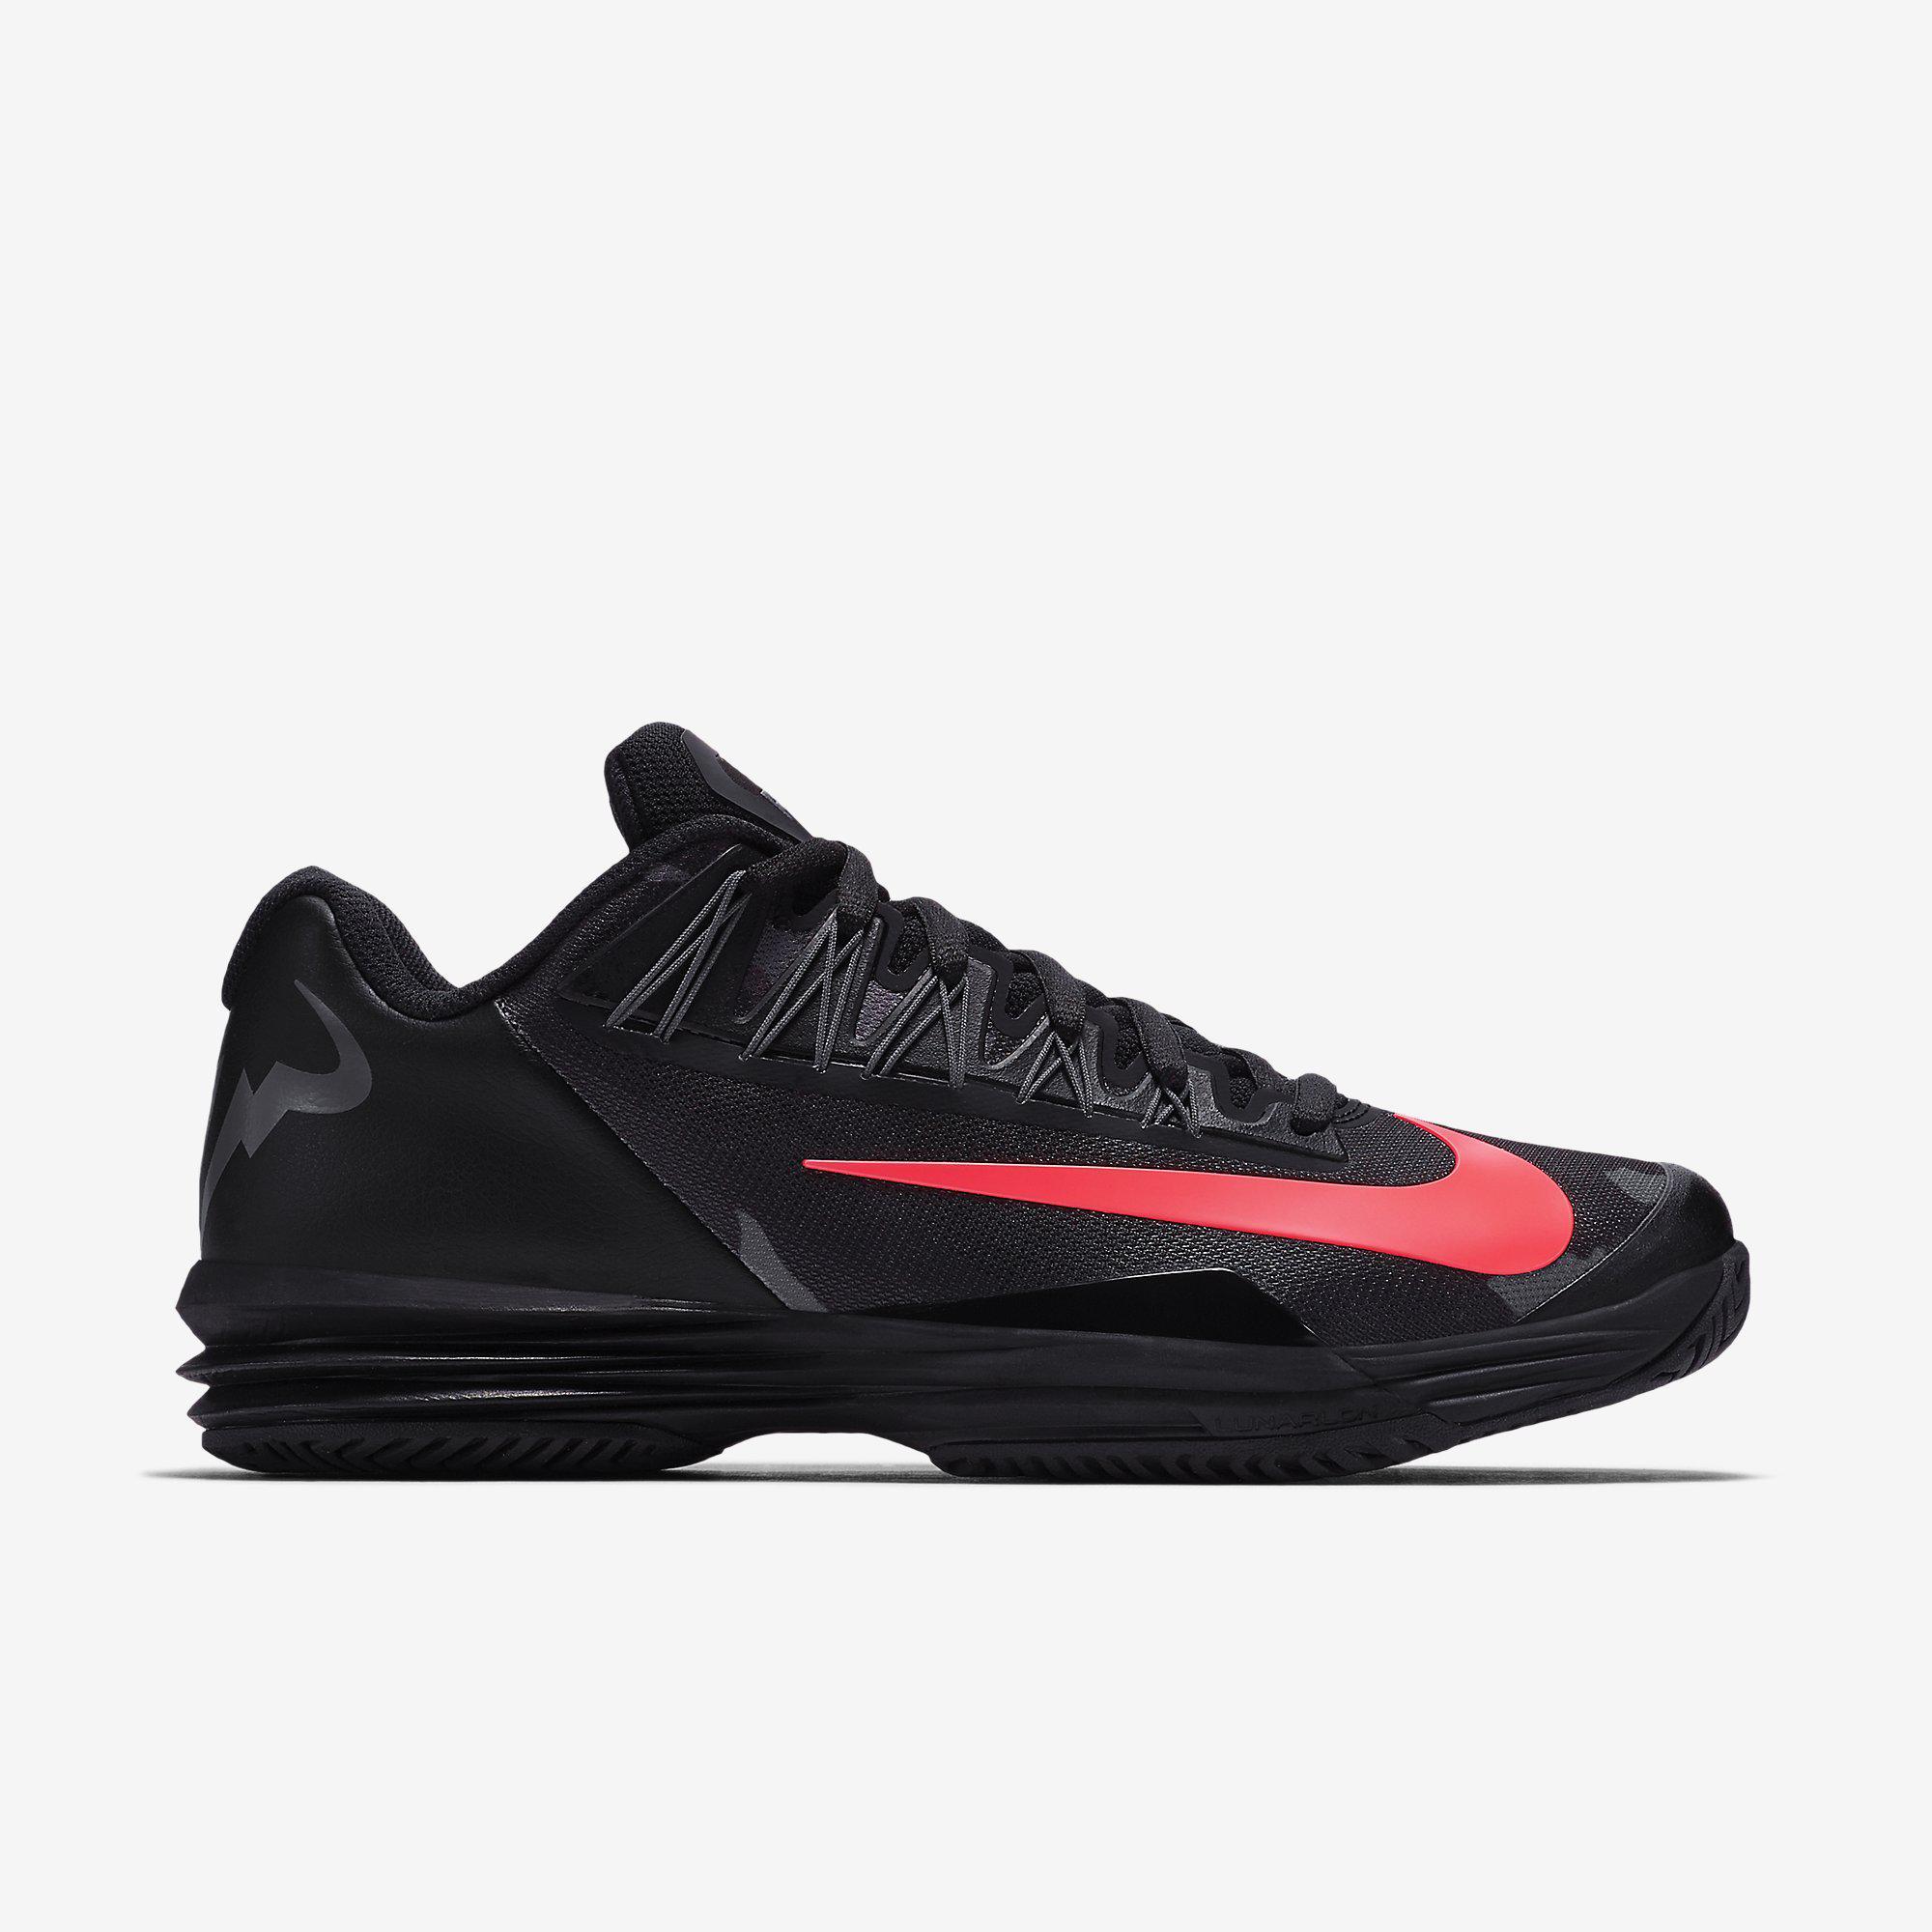 the best attitude 09ef5 3f538 ... White Hyper Turquoise Dark Ash Nike Mens Lunar Ballistec 1.5 Legend Tennis  Shoes - Black Anthracite ...